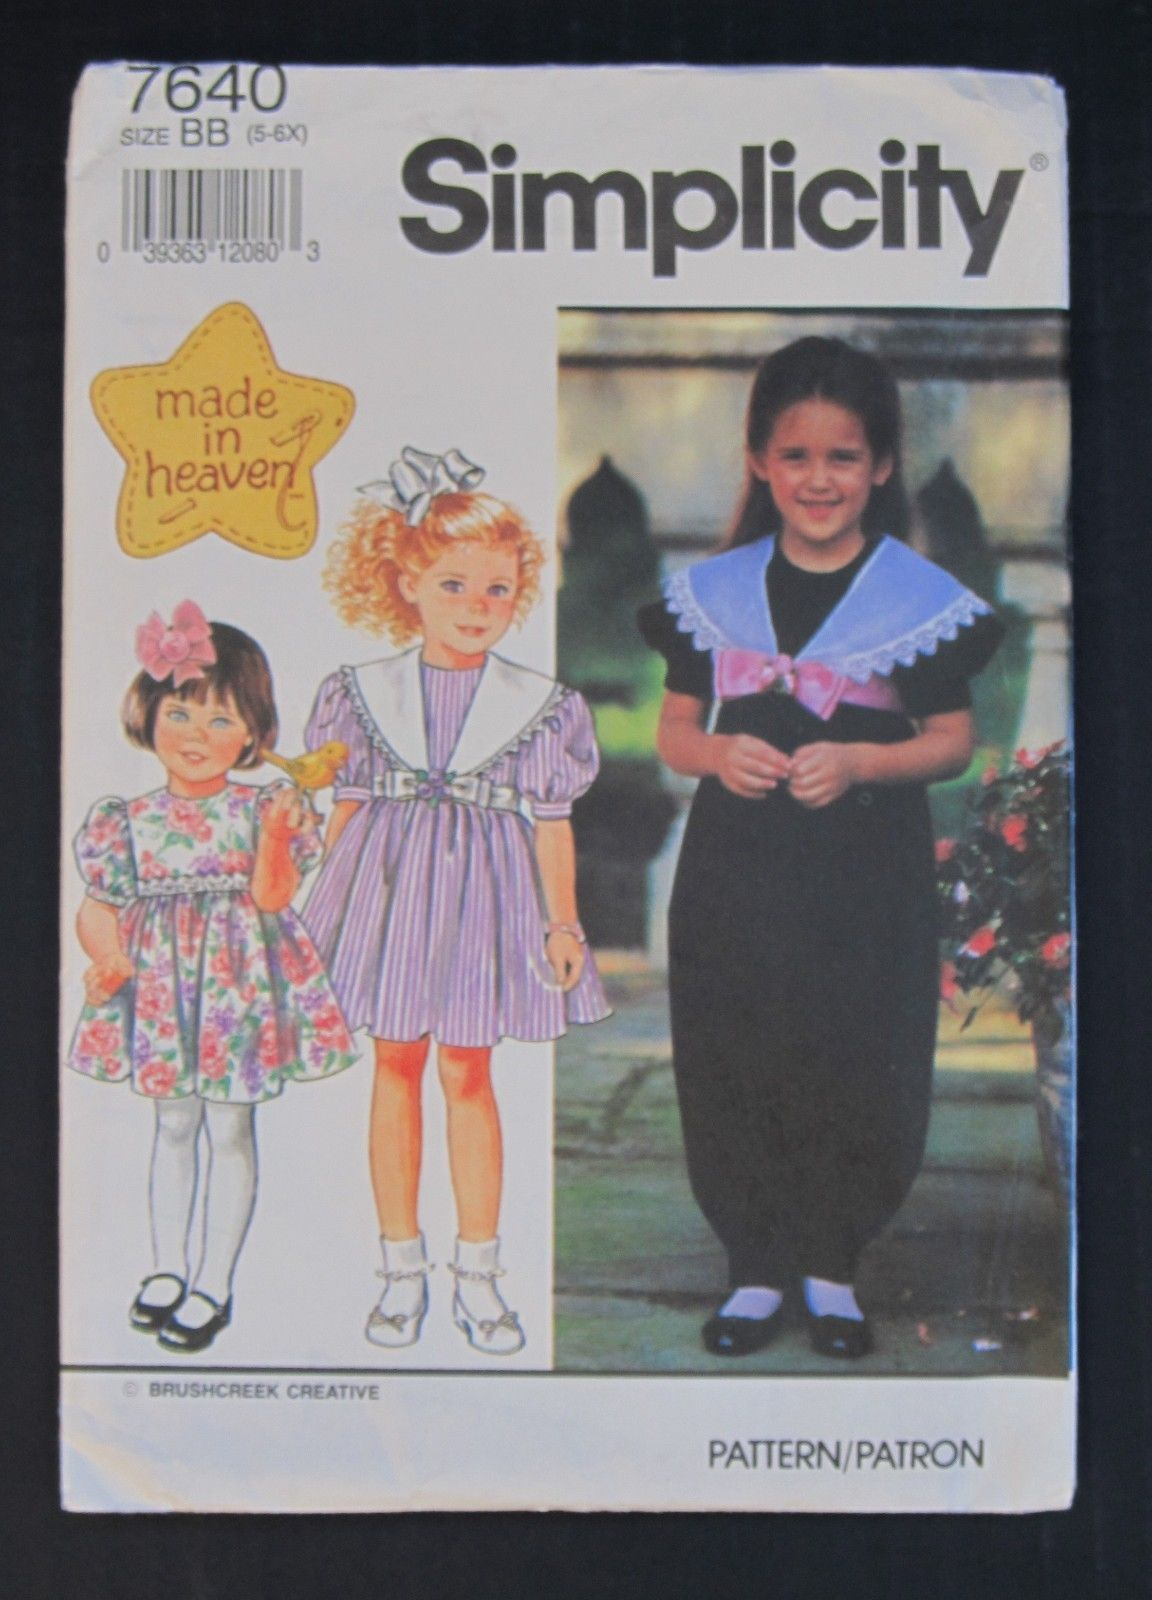 Simplicity #7640 Made In Heaven Girls Dress/Jumpsuit Sz 5-6X Pattern Part Uncut